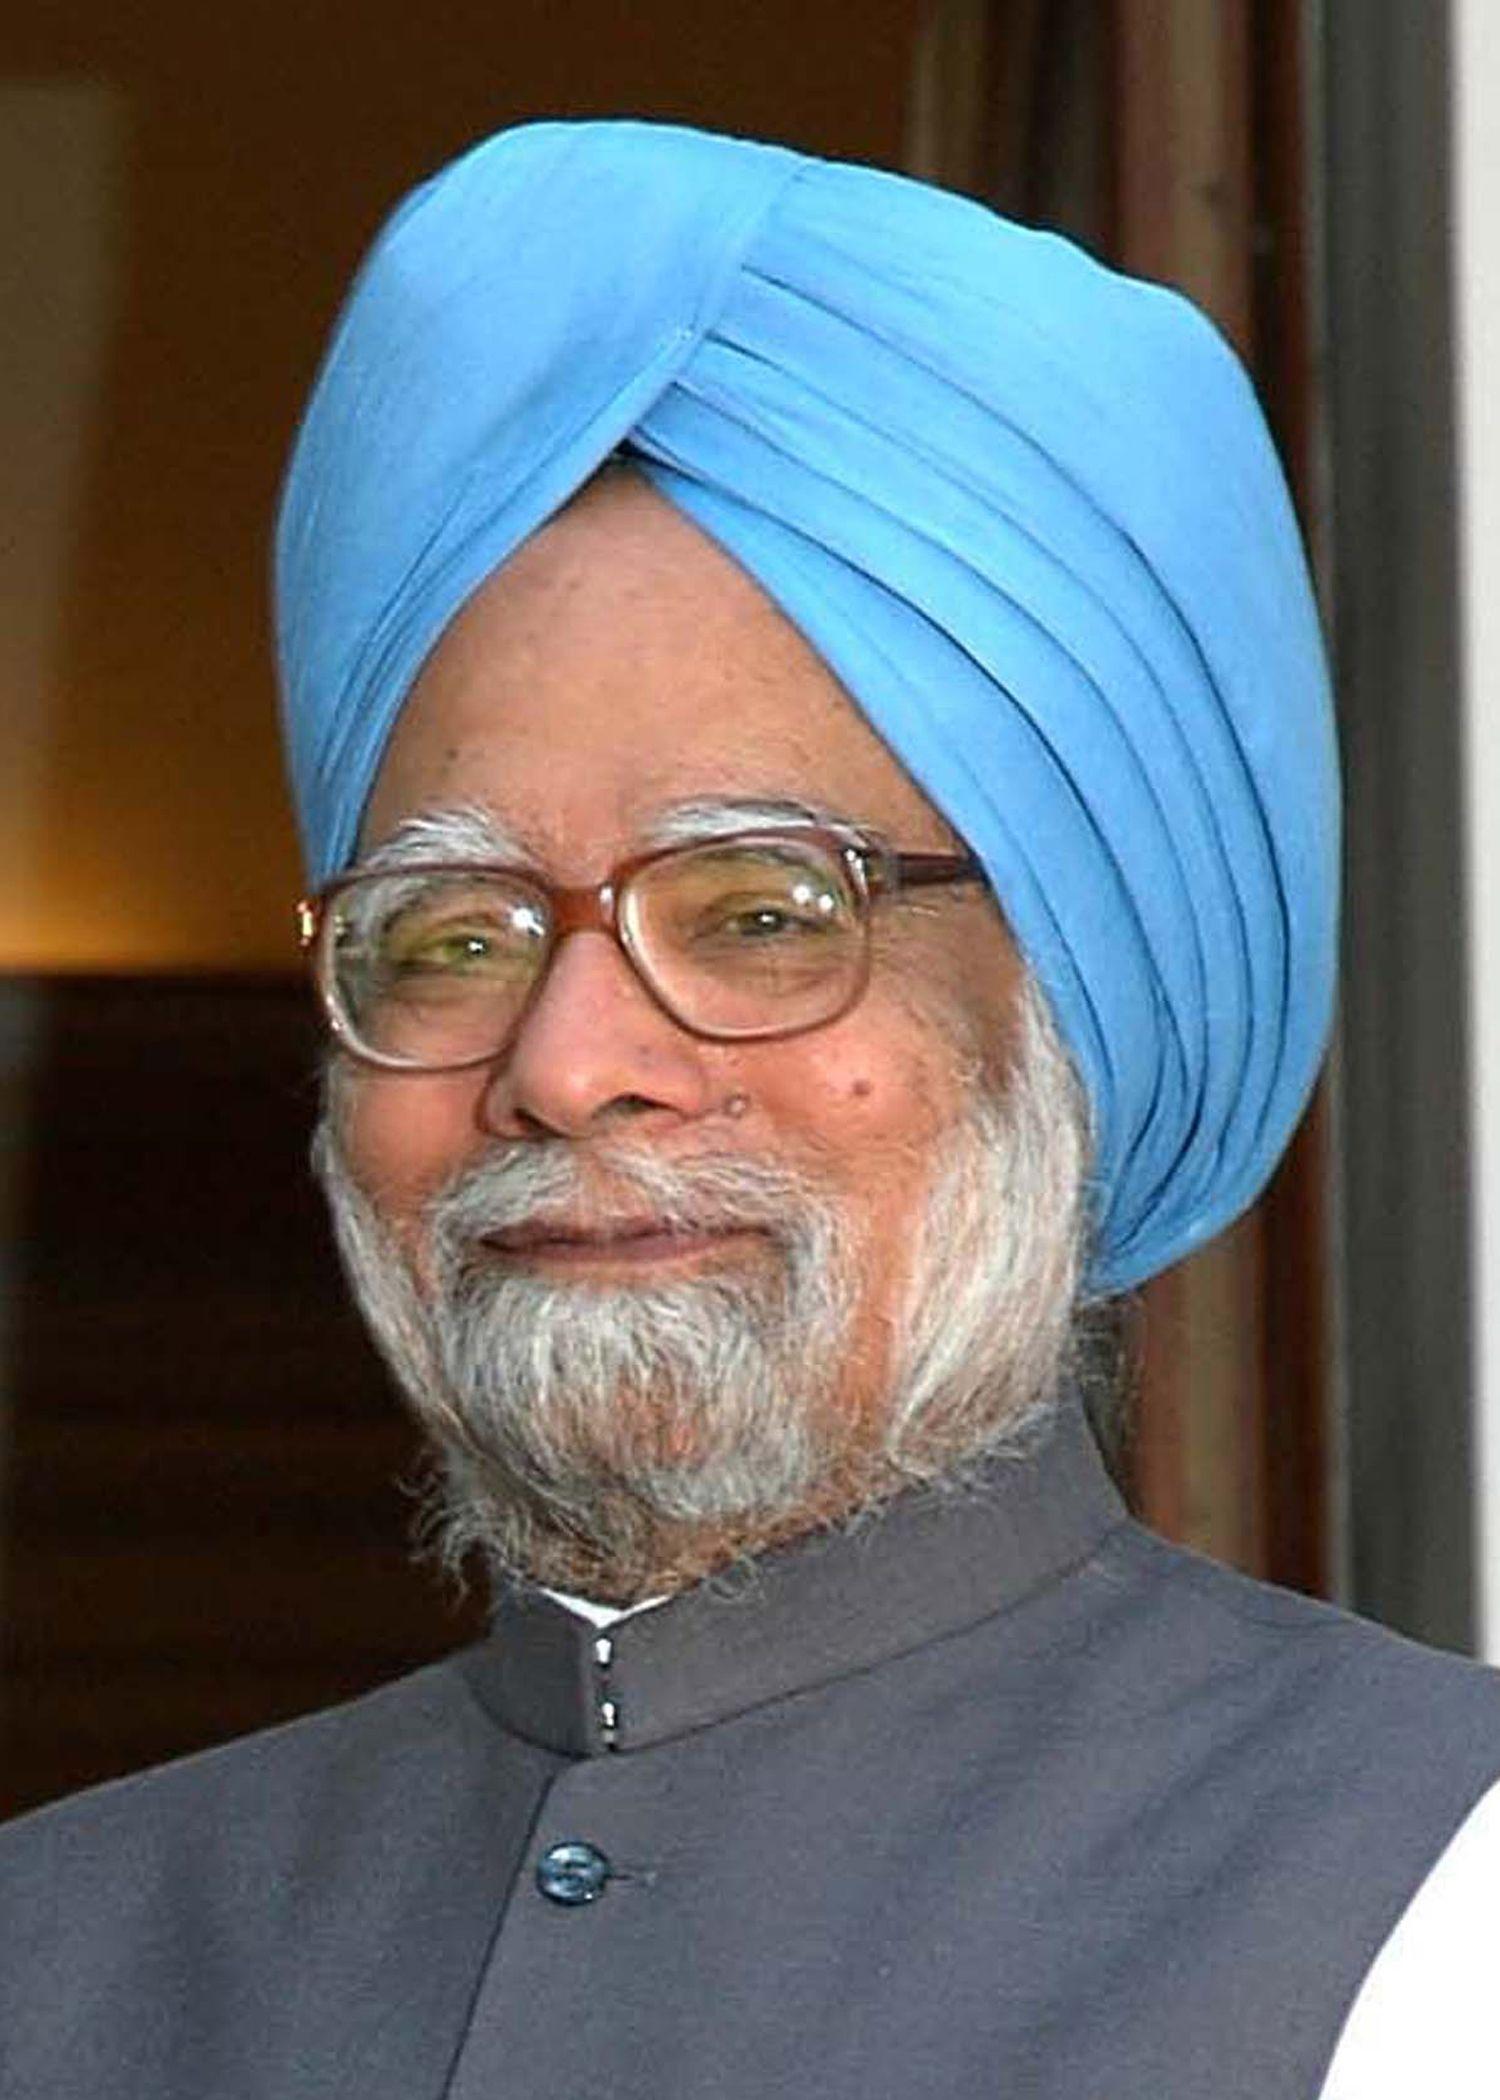 manmohan singh inspector general pinterest politicians